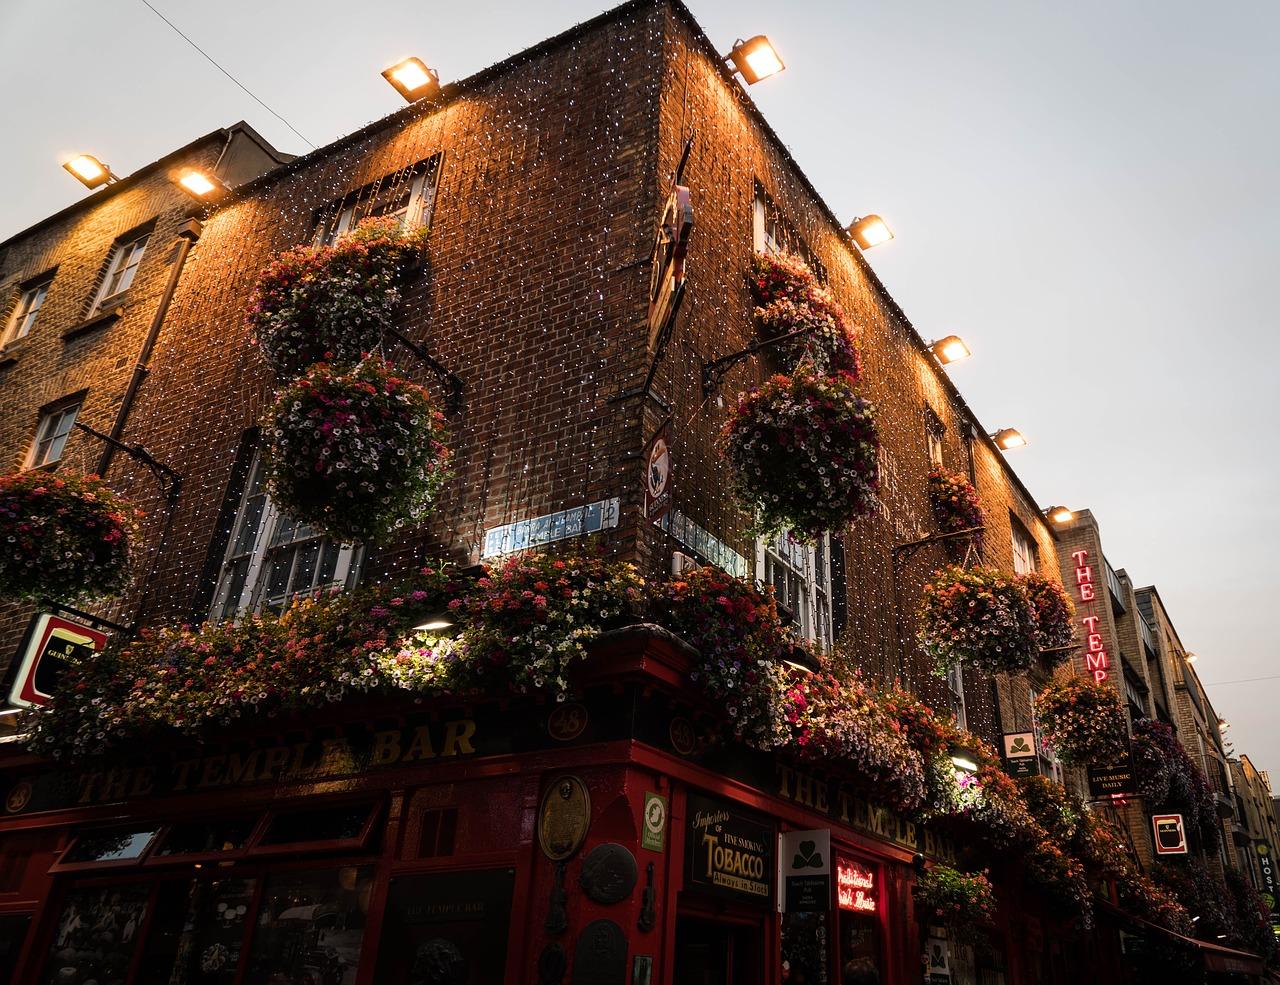 Entertainment in Dublin ab 6,75€ Irlands Hauptsadt Hotspots